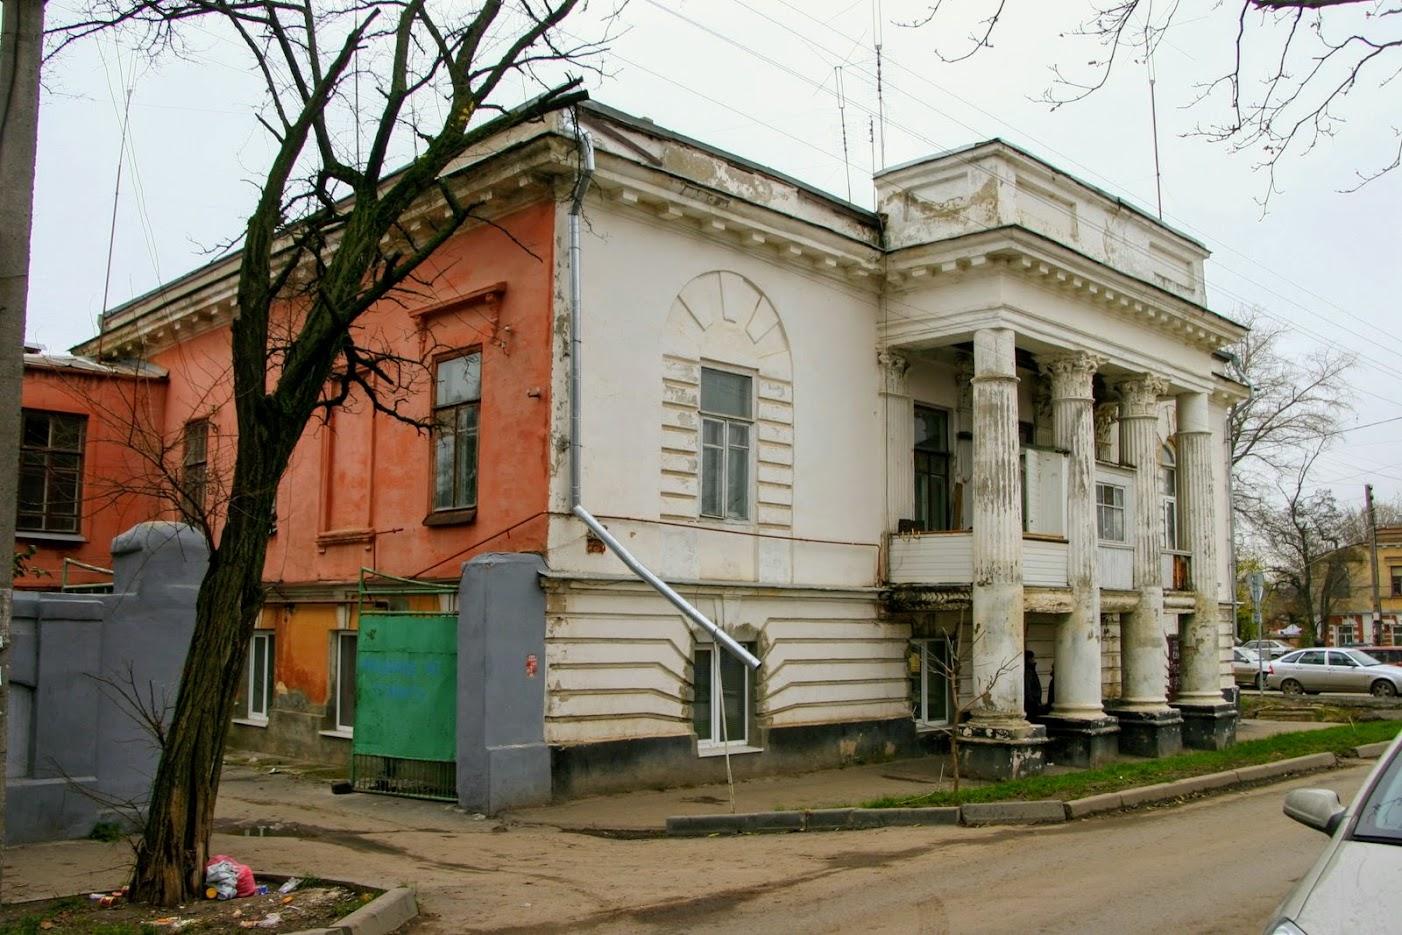 https://sites.google.com/site/istoriceskijtaganrog/cehova-ulica/dom-129